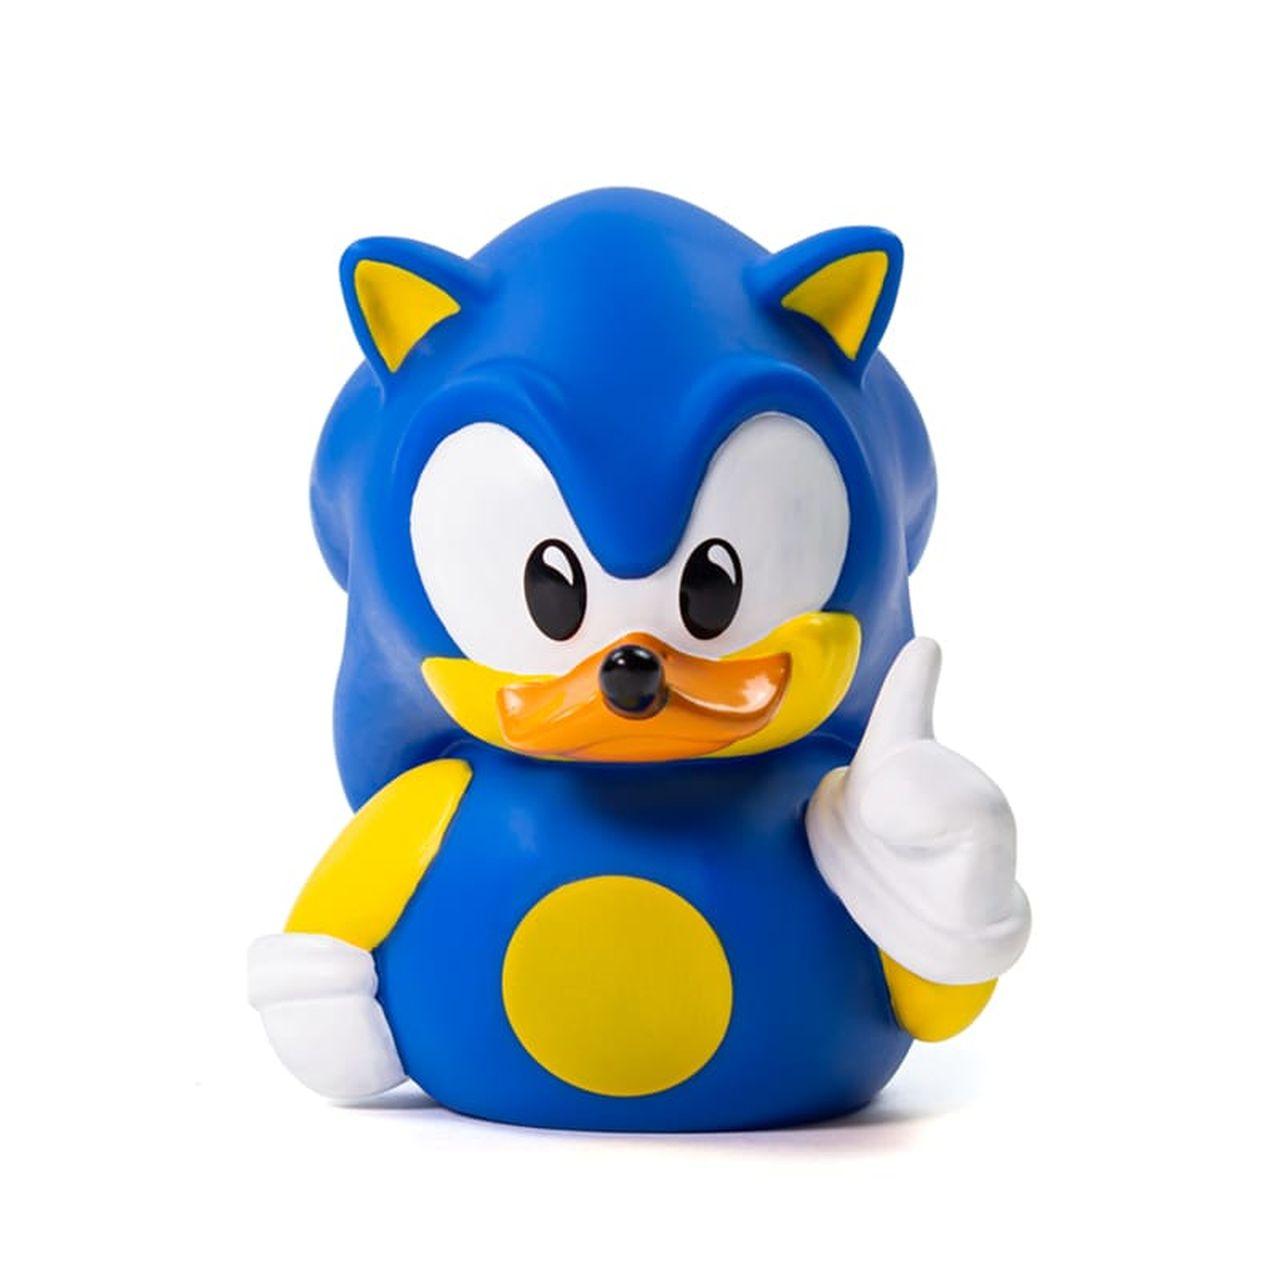 PRÉ VENDA: Tubbz Sonic: Sonic the Hedgehog (Cosplaying Duck Collectible) Patinho Colecionável - EV